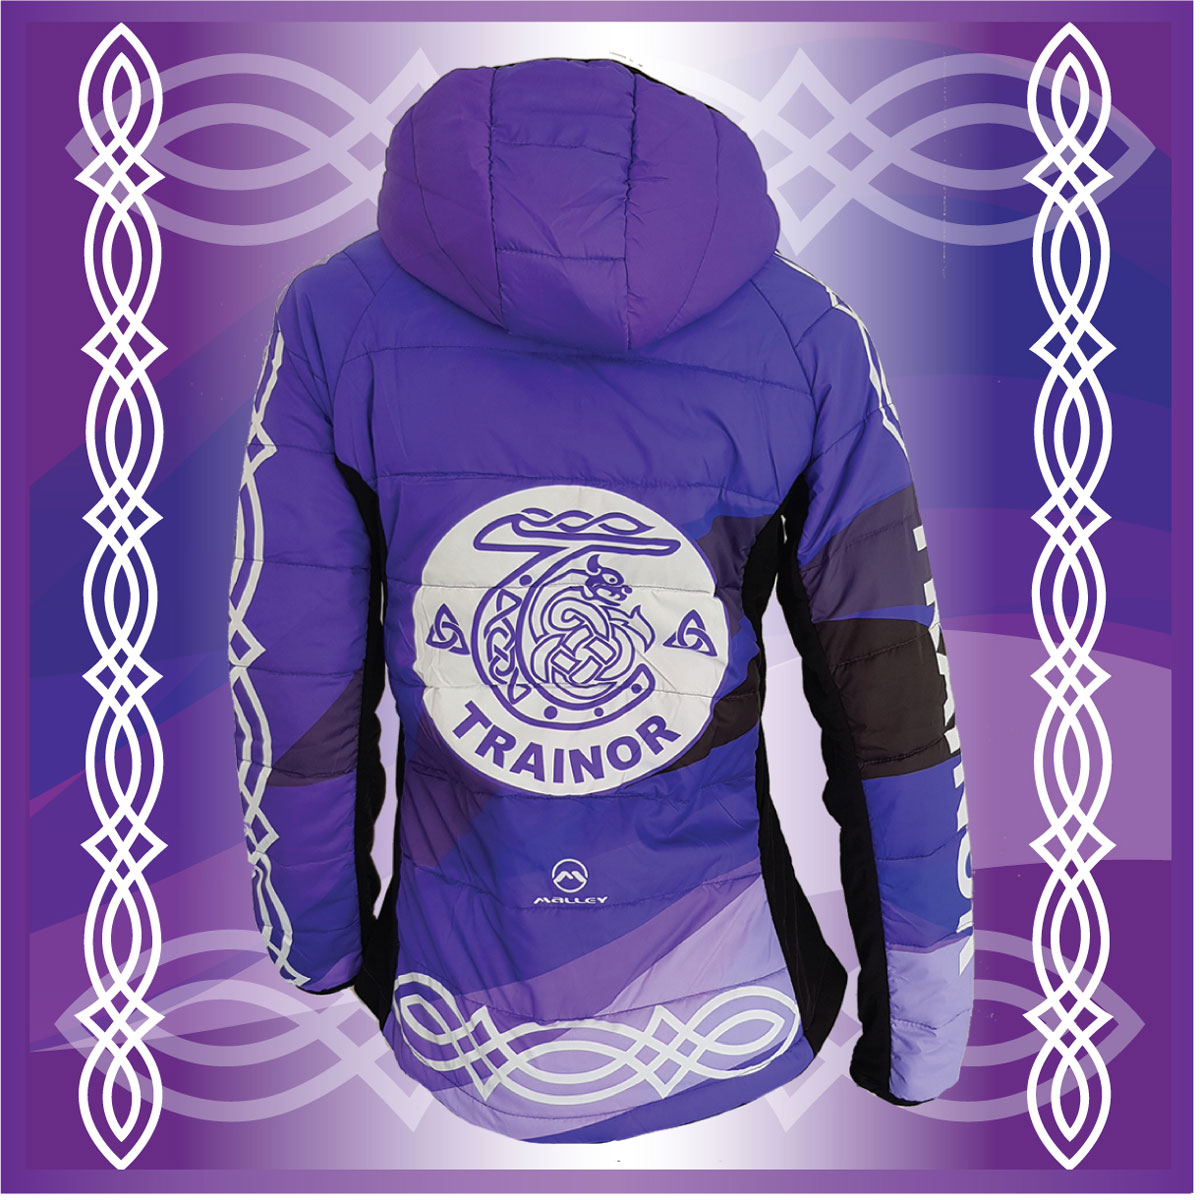 trainor_puffa_jacket_back_design.jpg